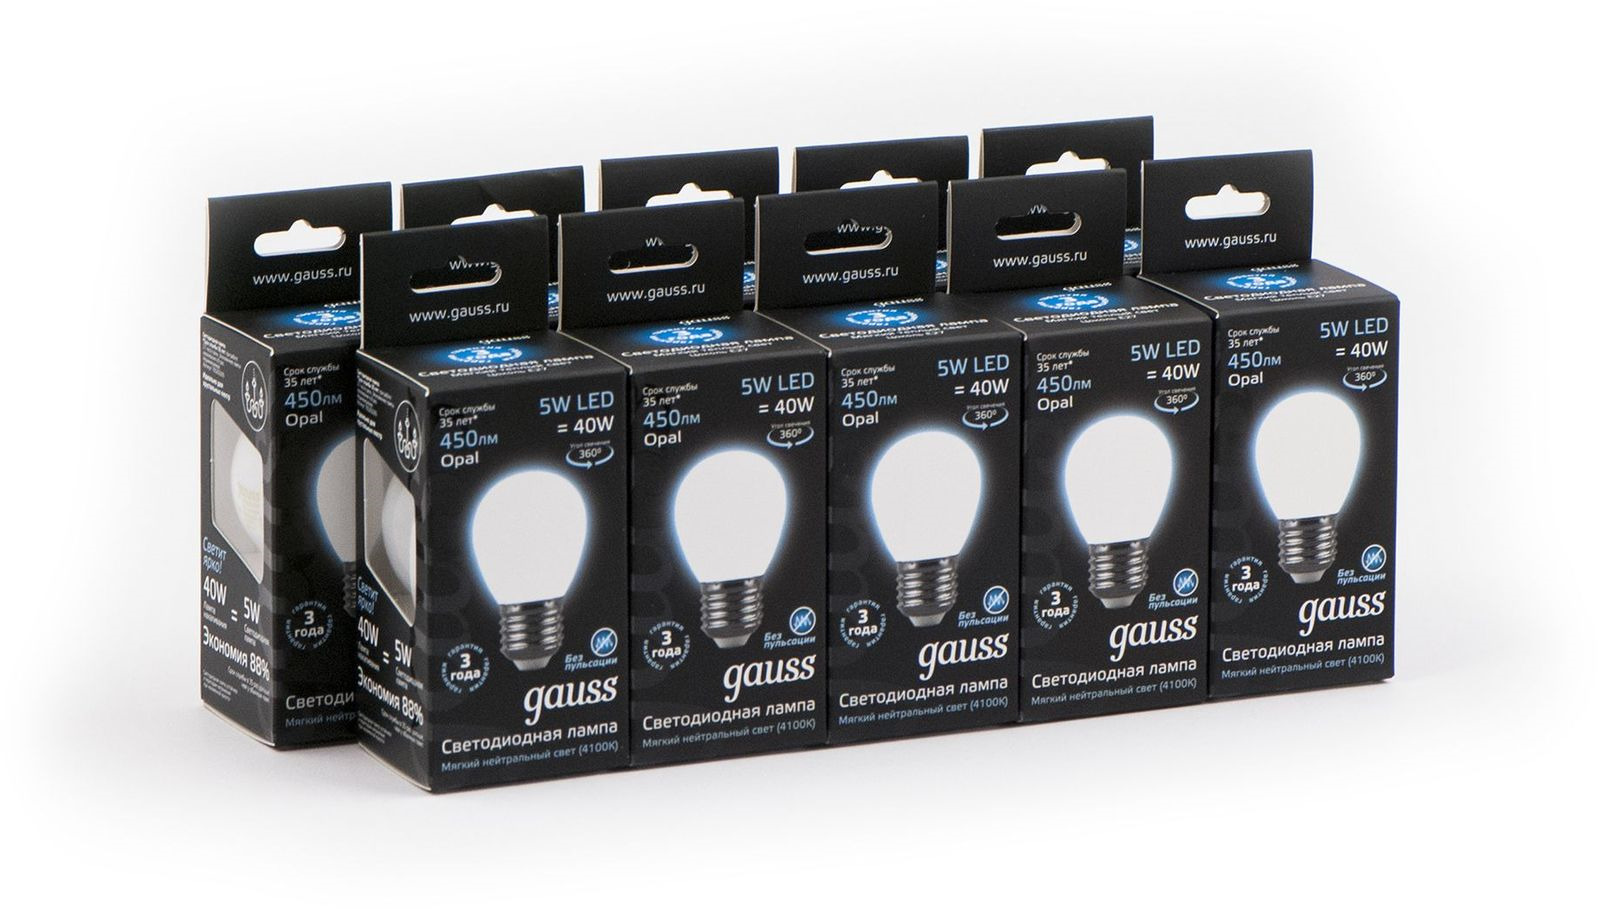 Лампочка Gauss Светодиодная Black Filament Шар Opal 10 шт, Нейтральный свет 5 Вт, Светодиодная лампочка gauss black filament opal led свеча e14 5w 103201105